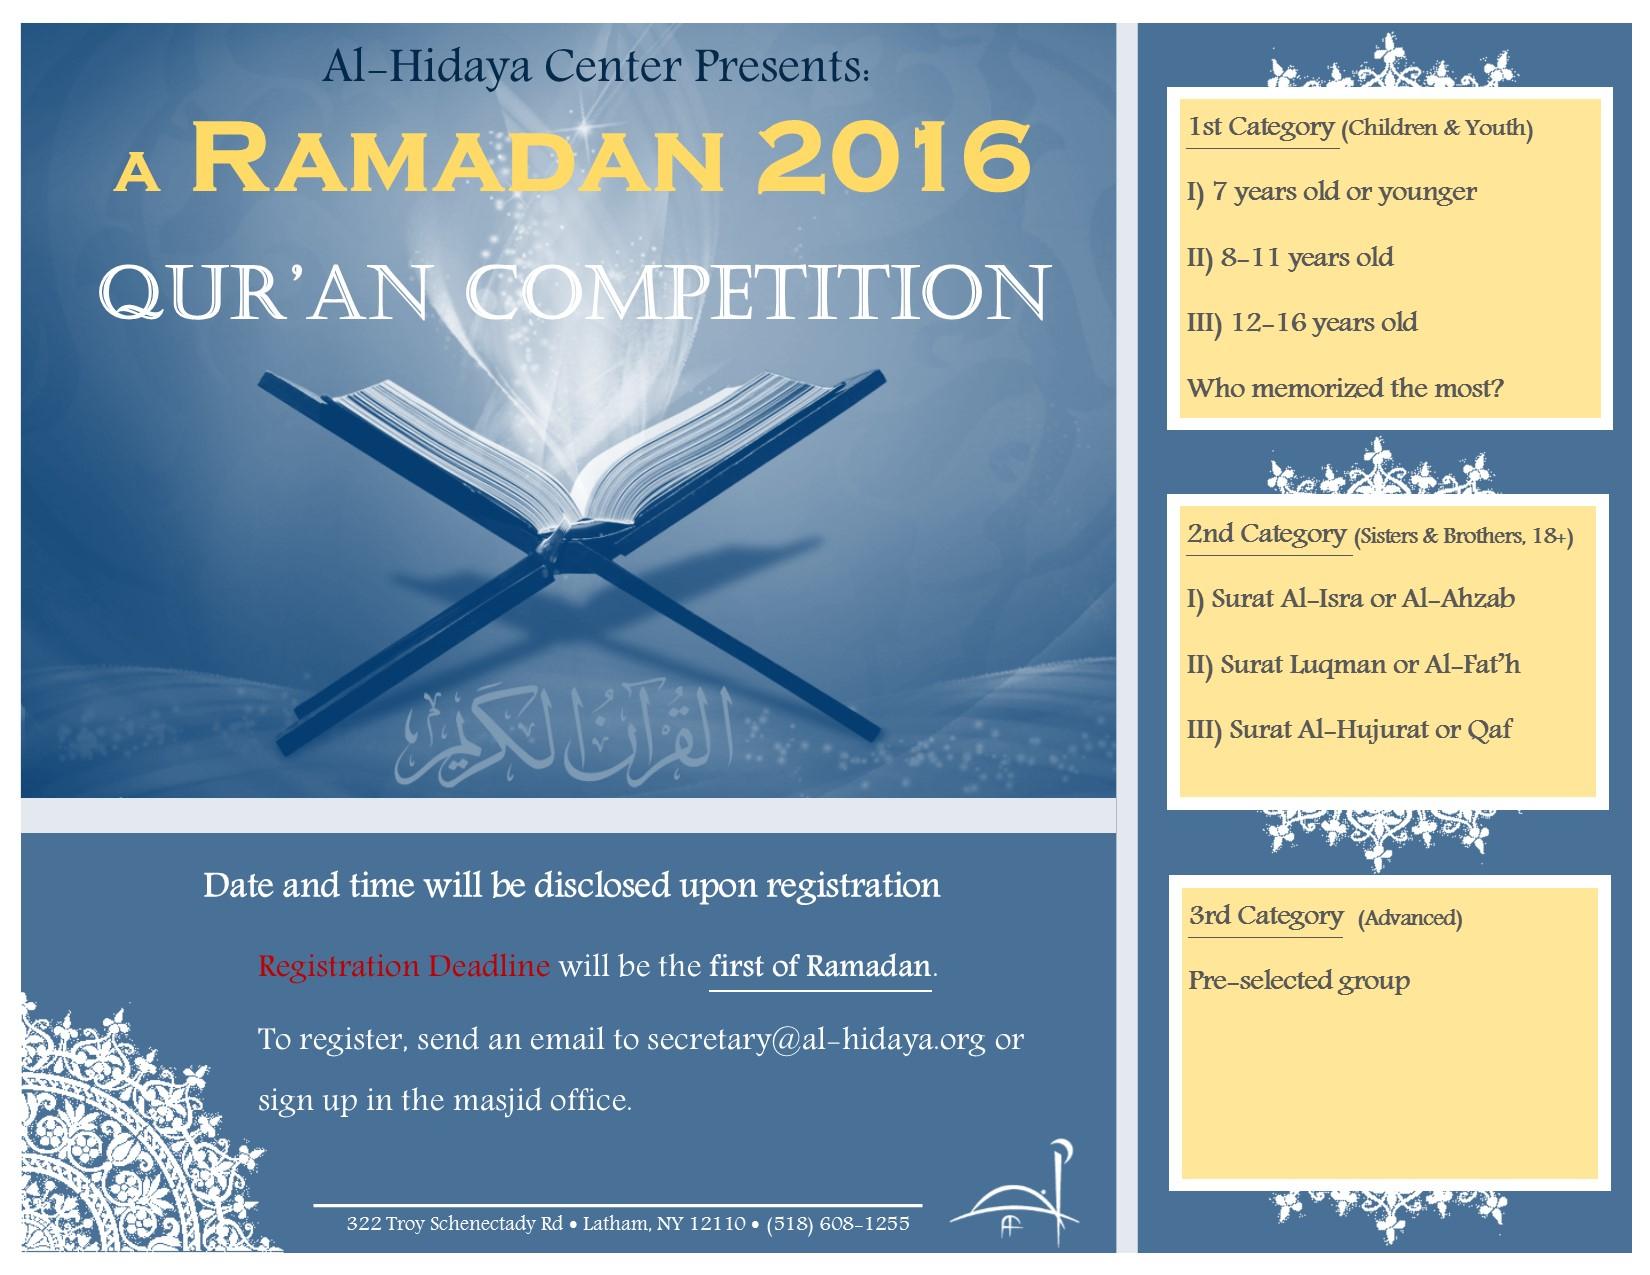 Ramadan 2016 Quran Competition - Al-Hidaya Center